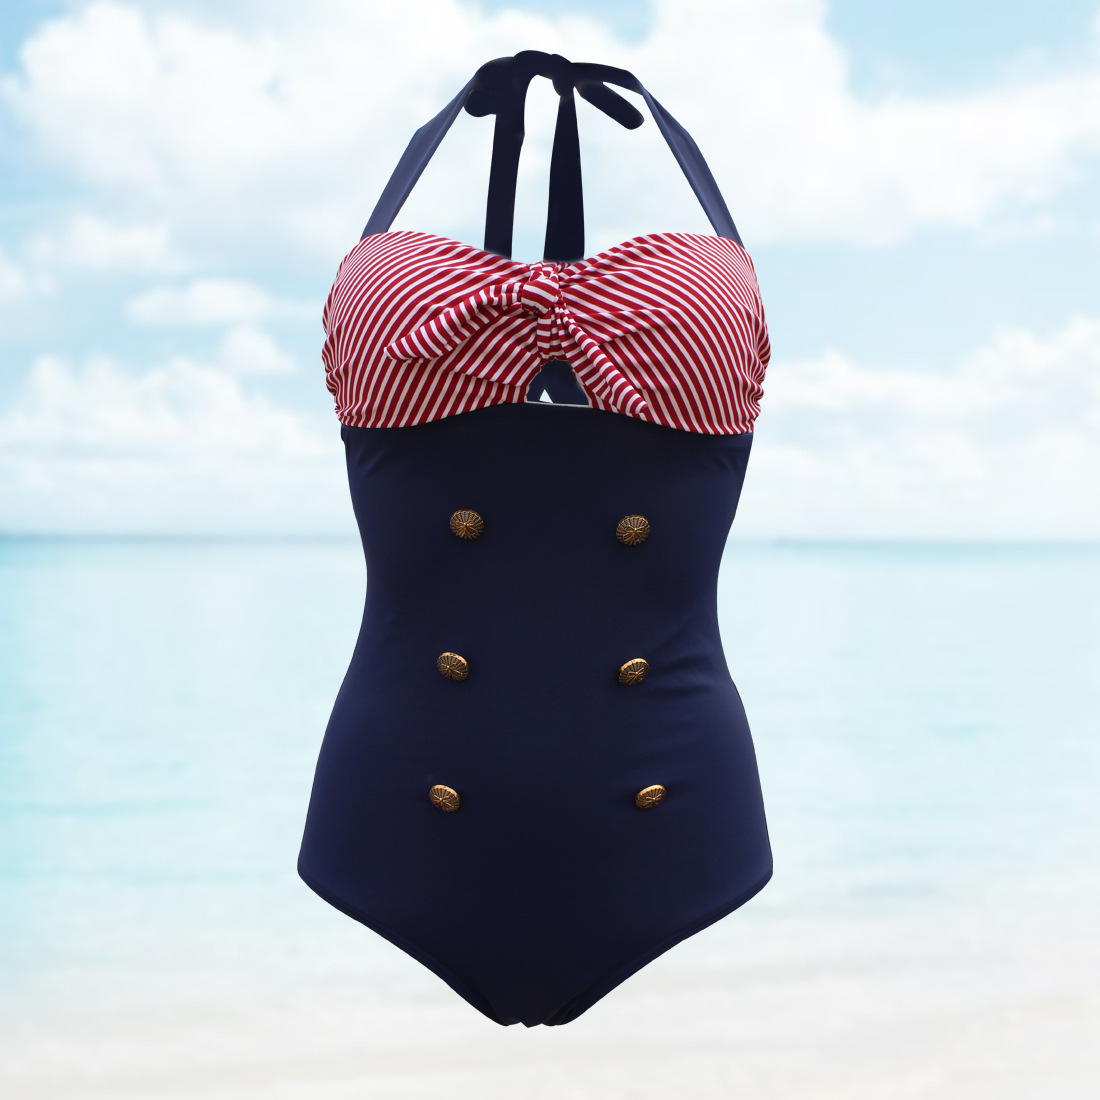 d088e8fed917 Plus Size Vintage Inspired Halter Stripe Monokini Swimwear from Kashion